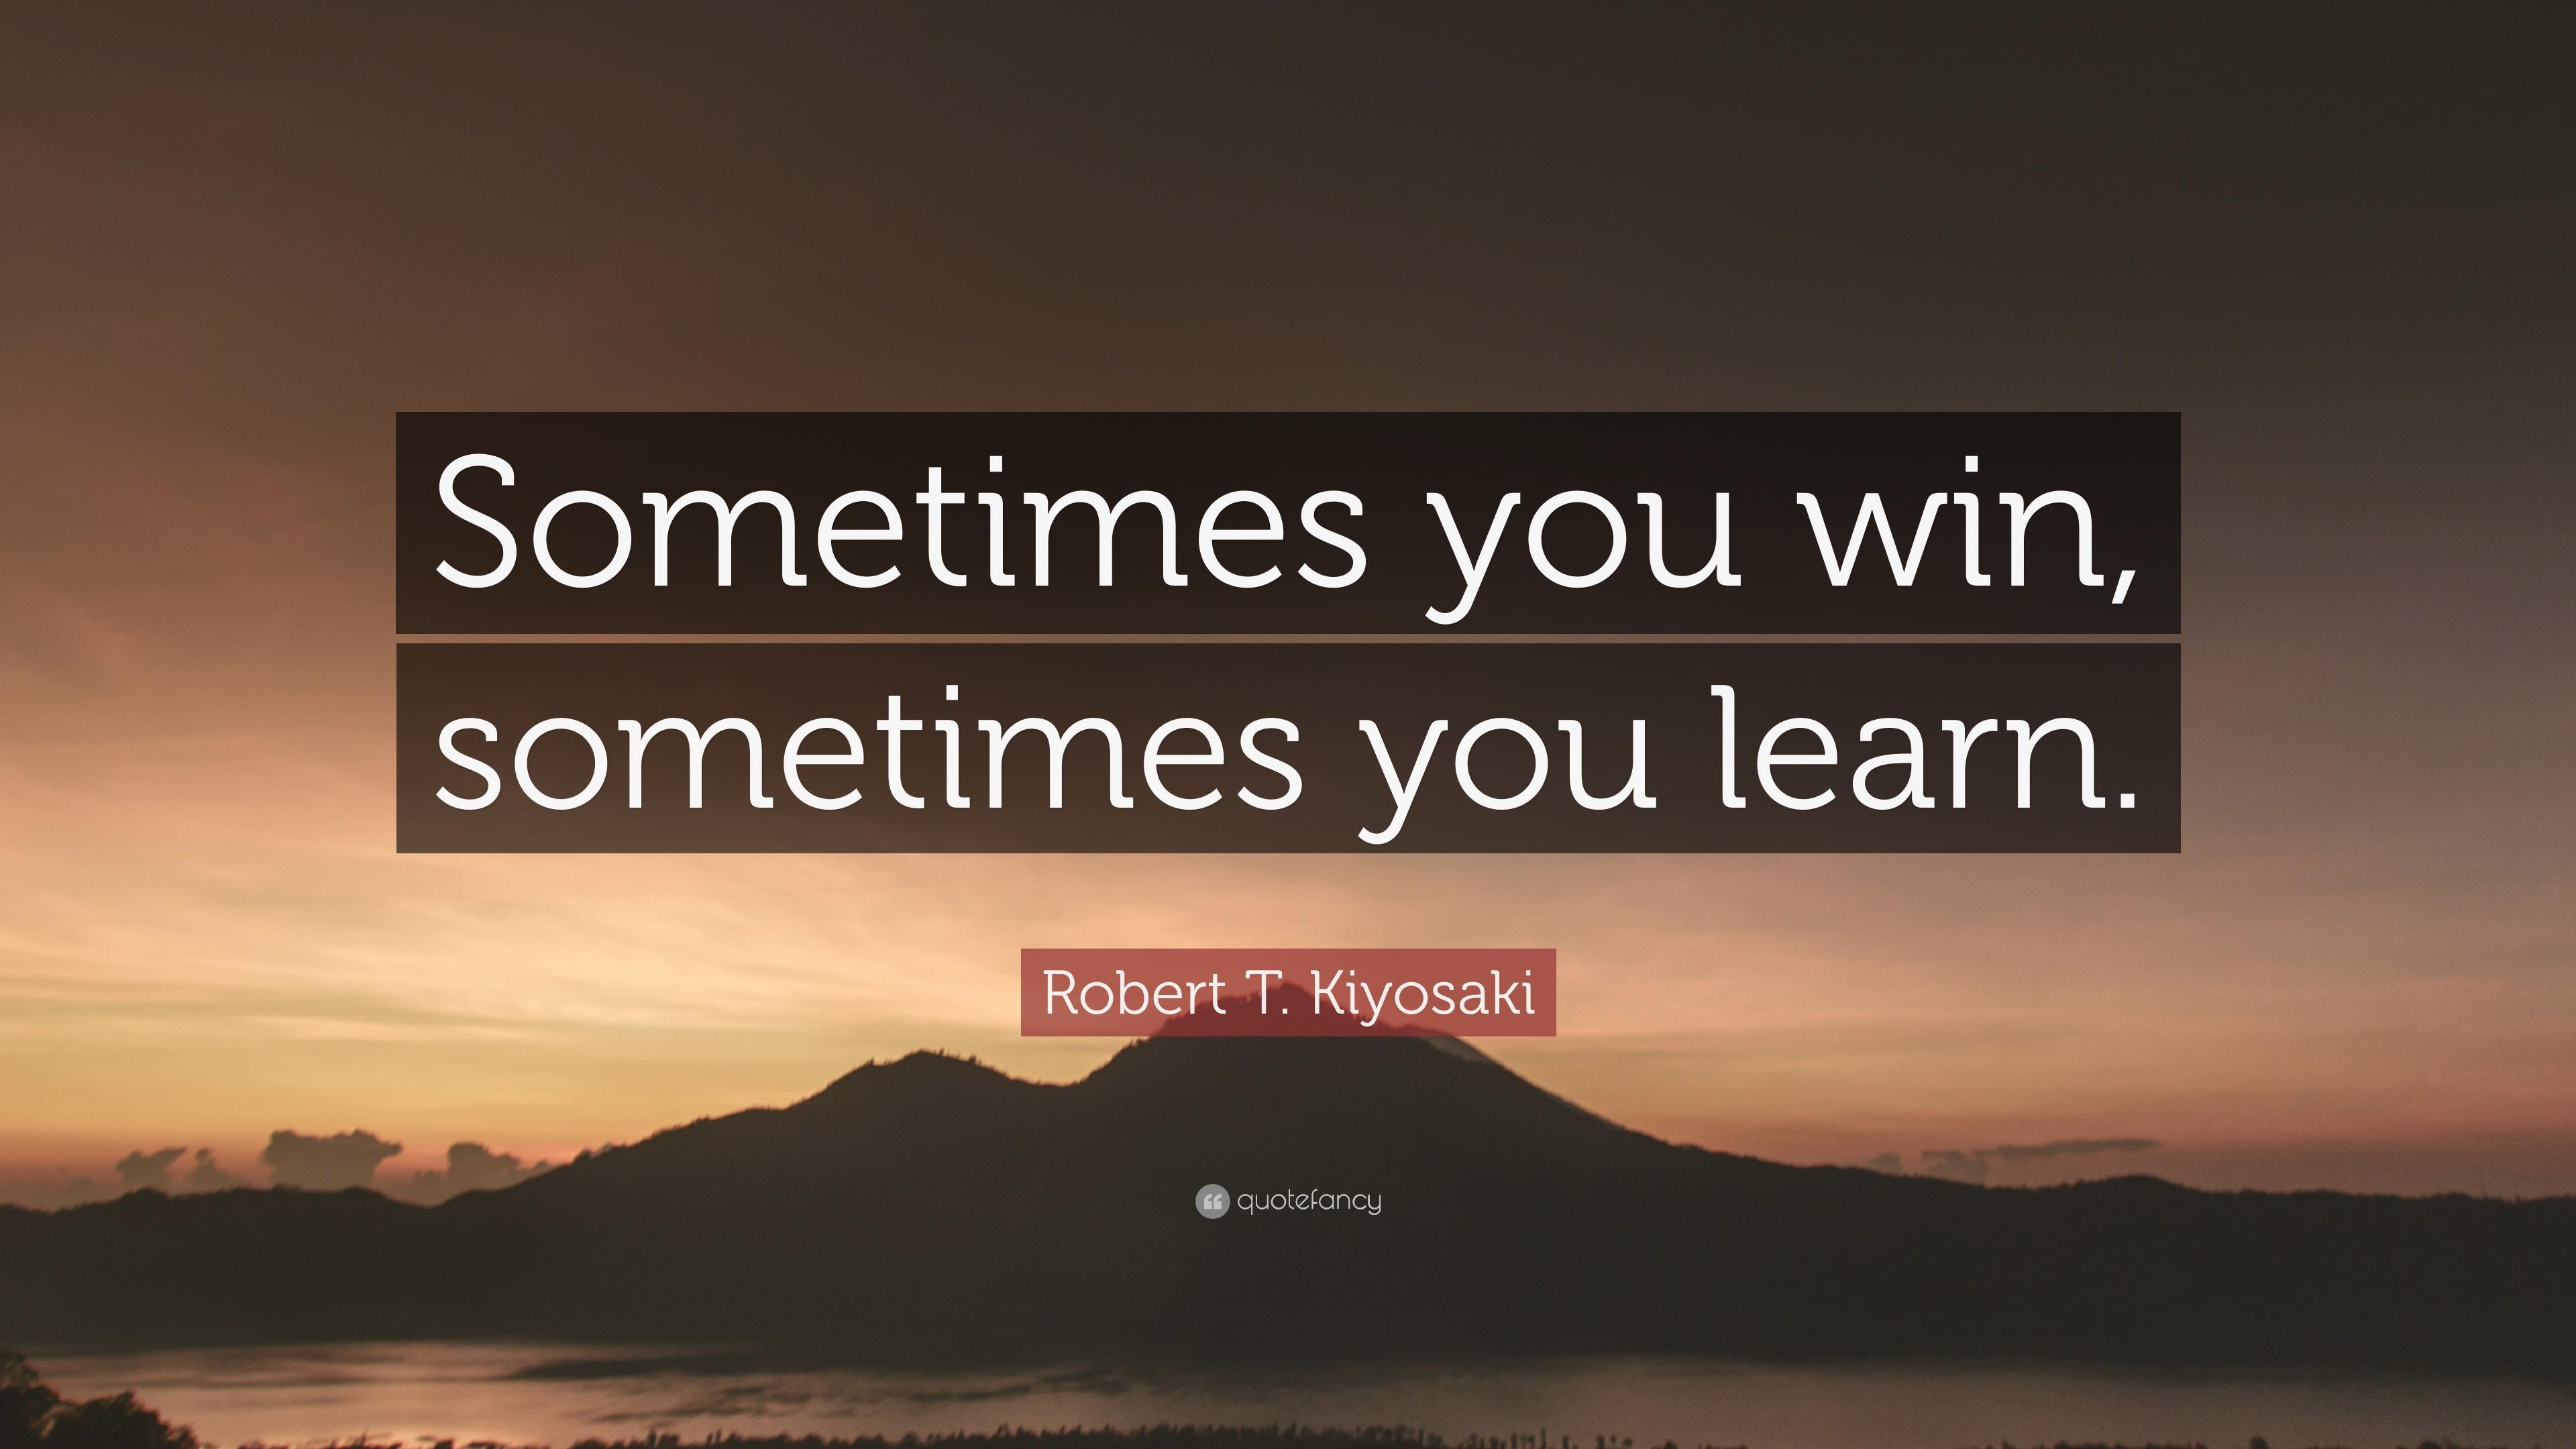 Robert T Kiyosaki Quote Sometimes You Win Sometimes You Learn